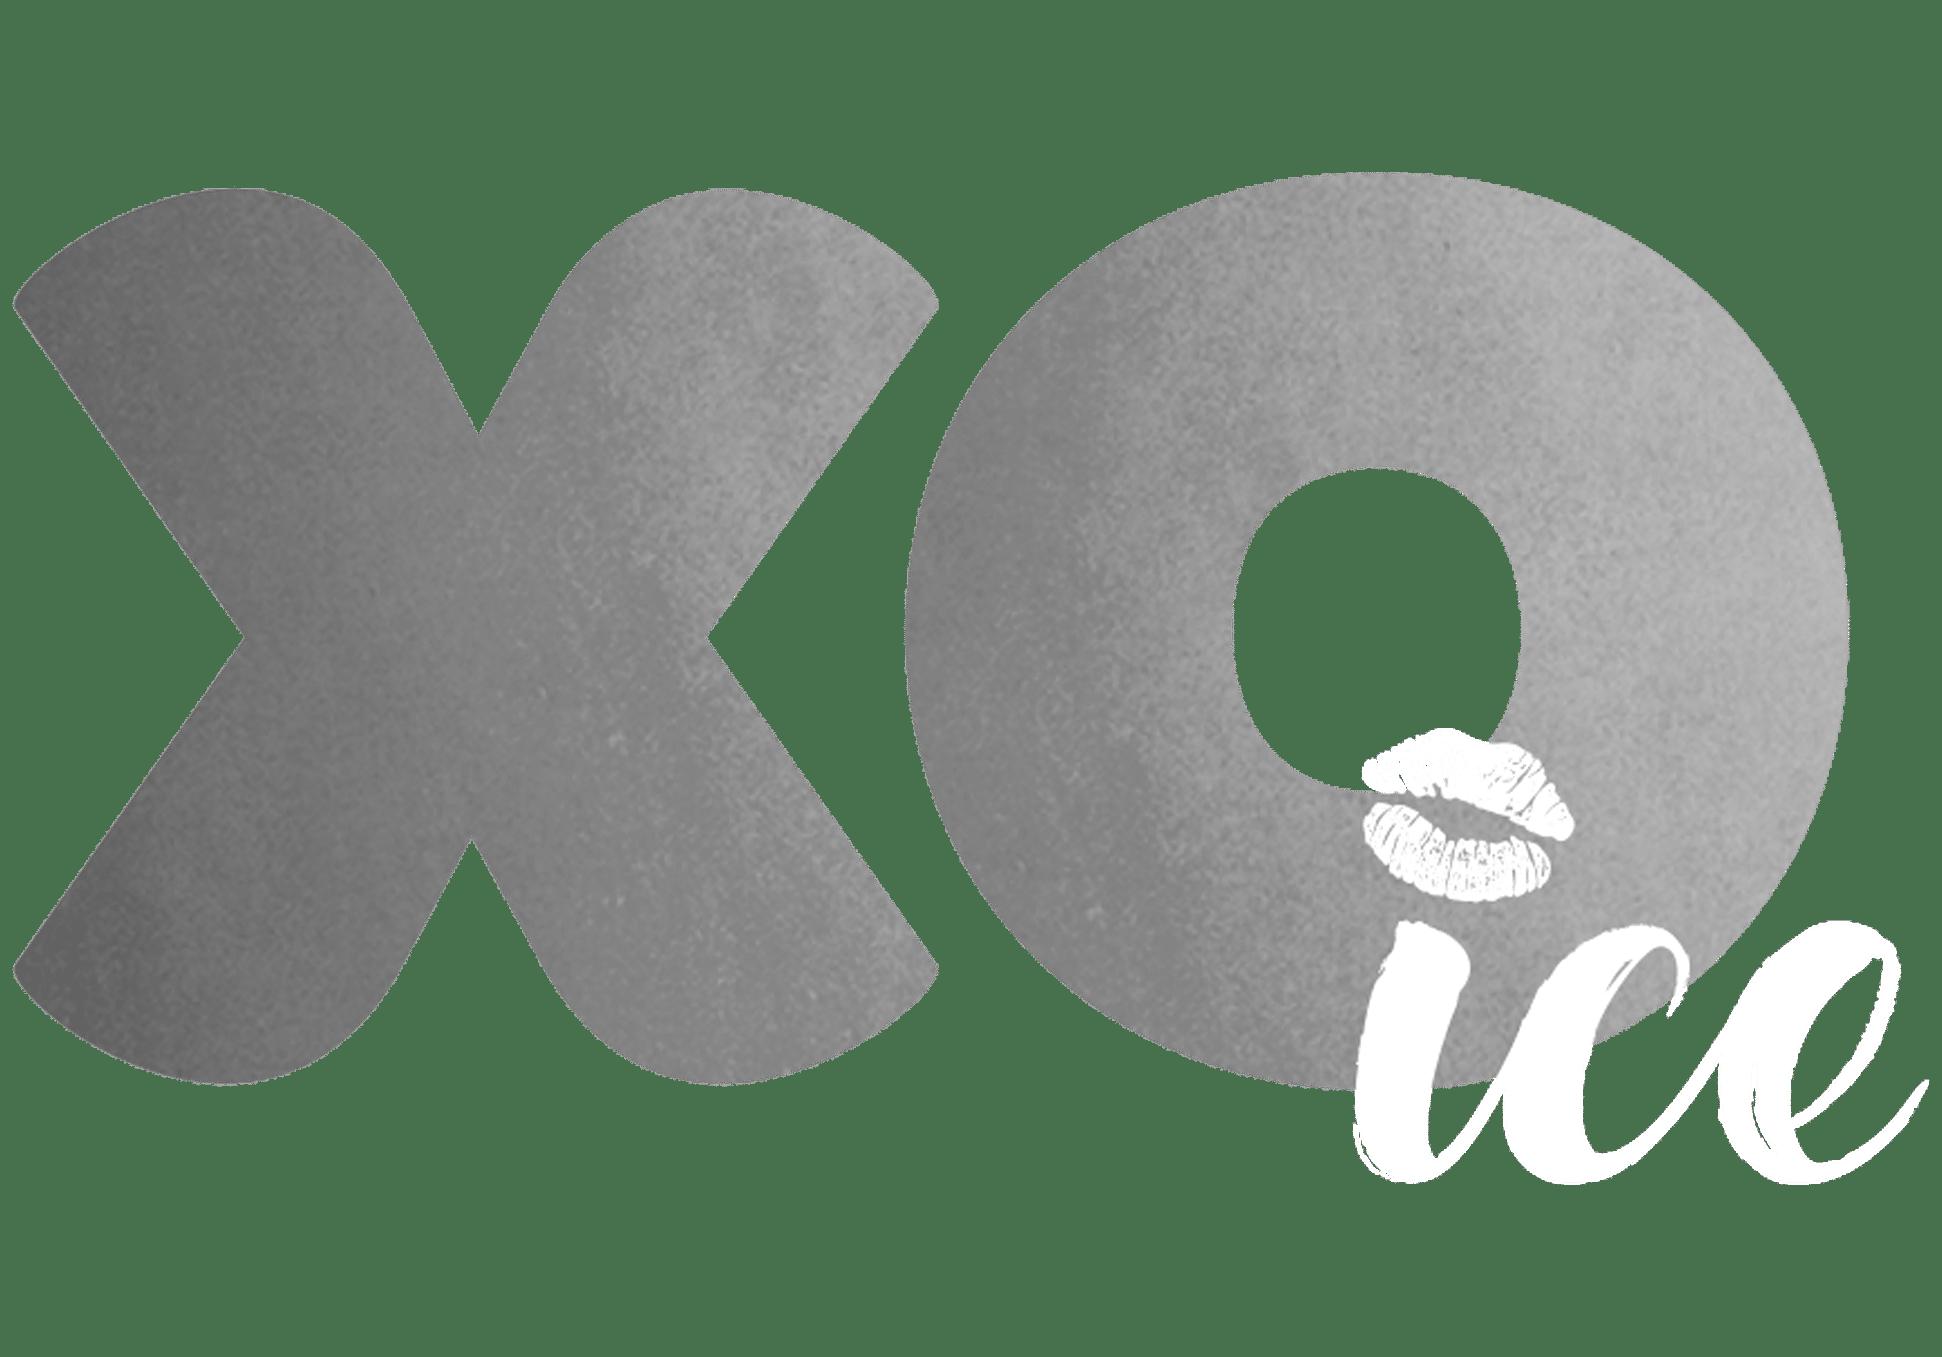 agence branding paris design - Glace XO